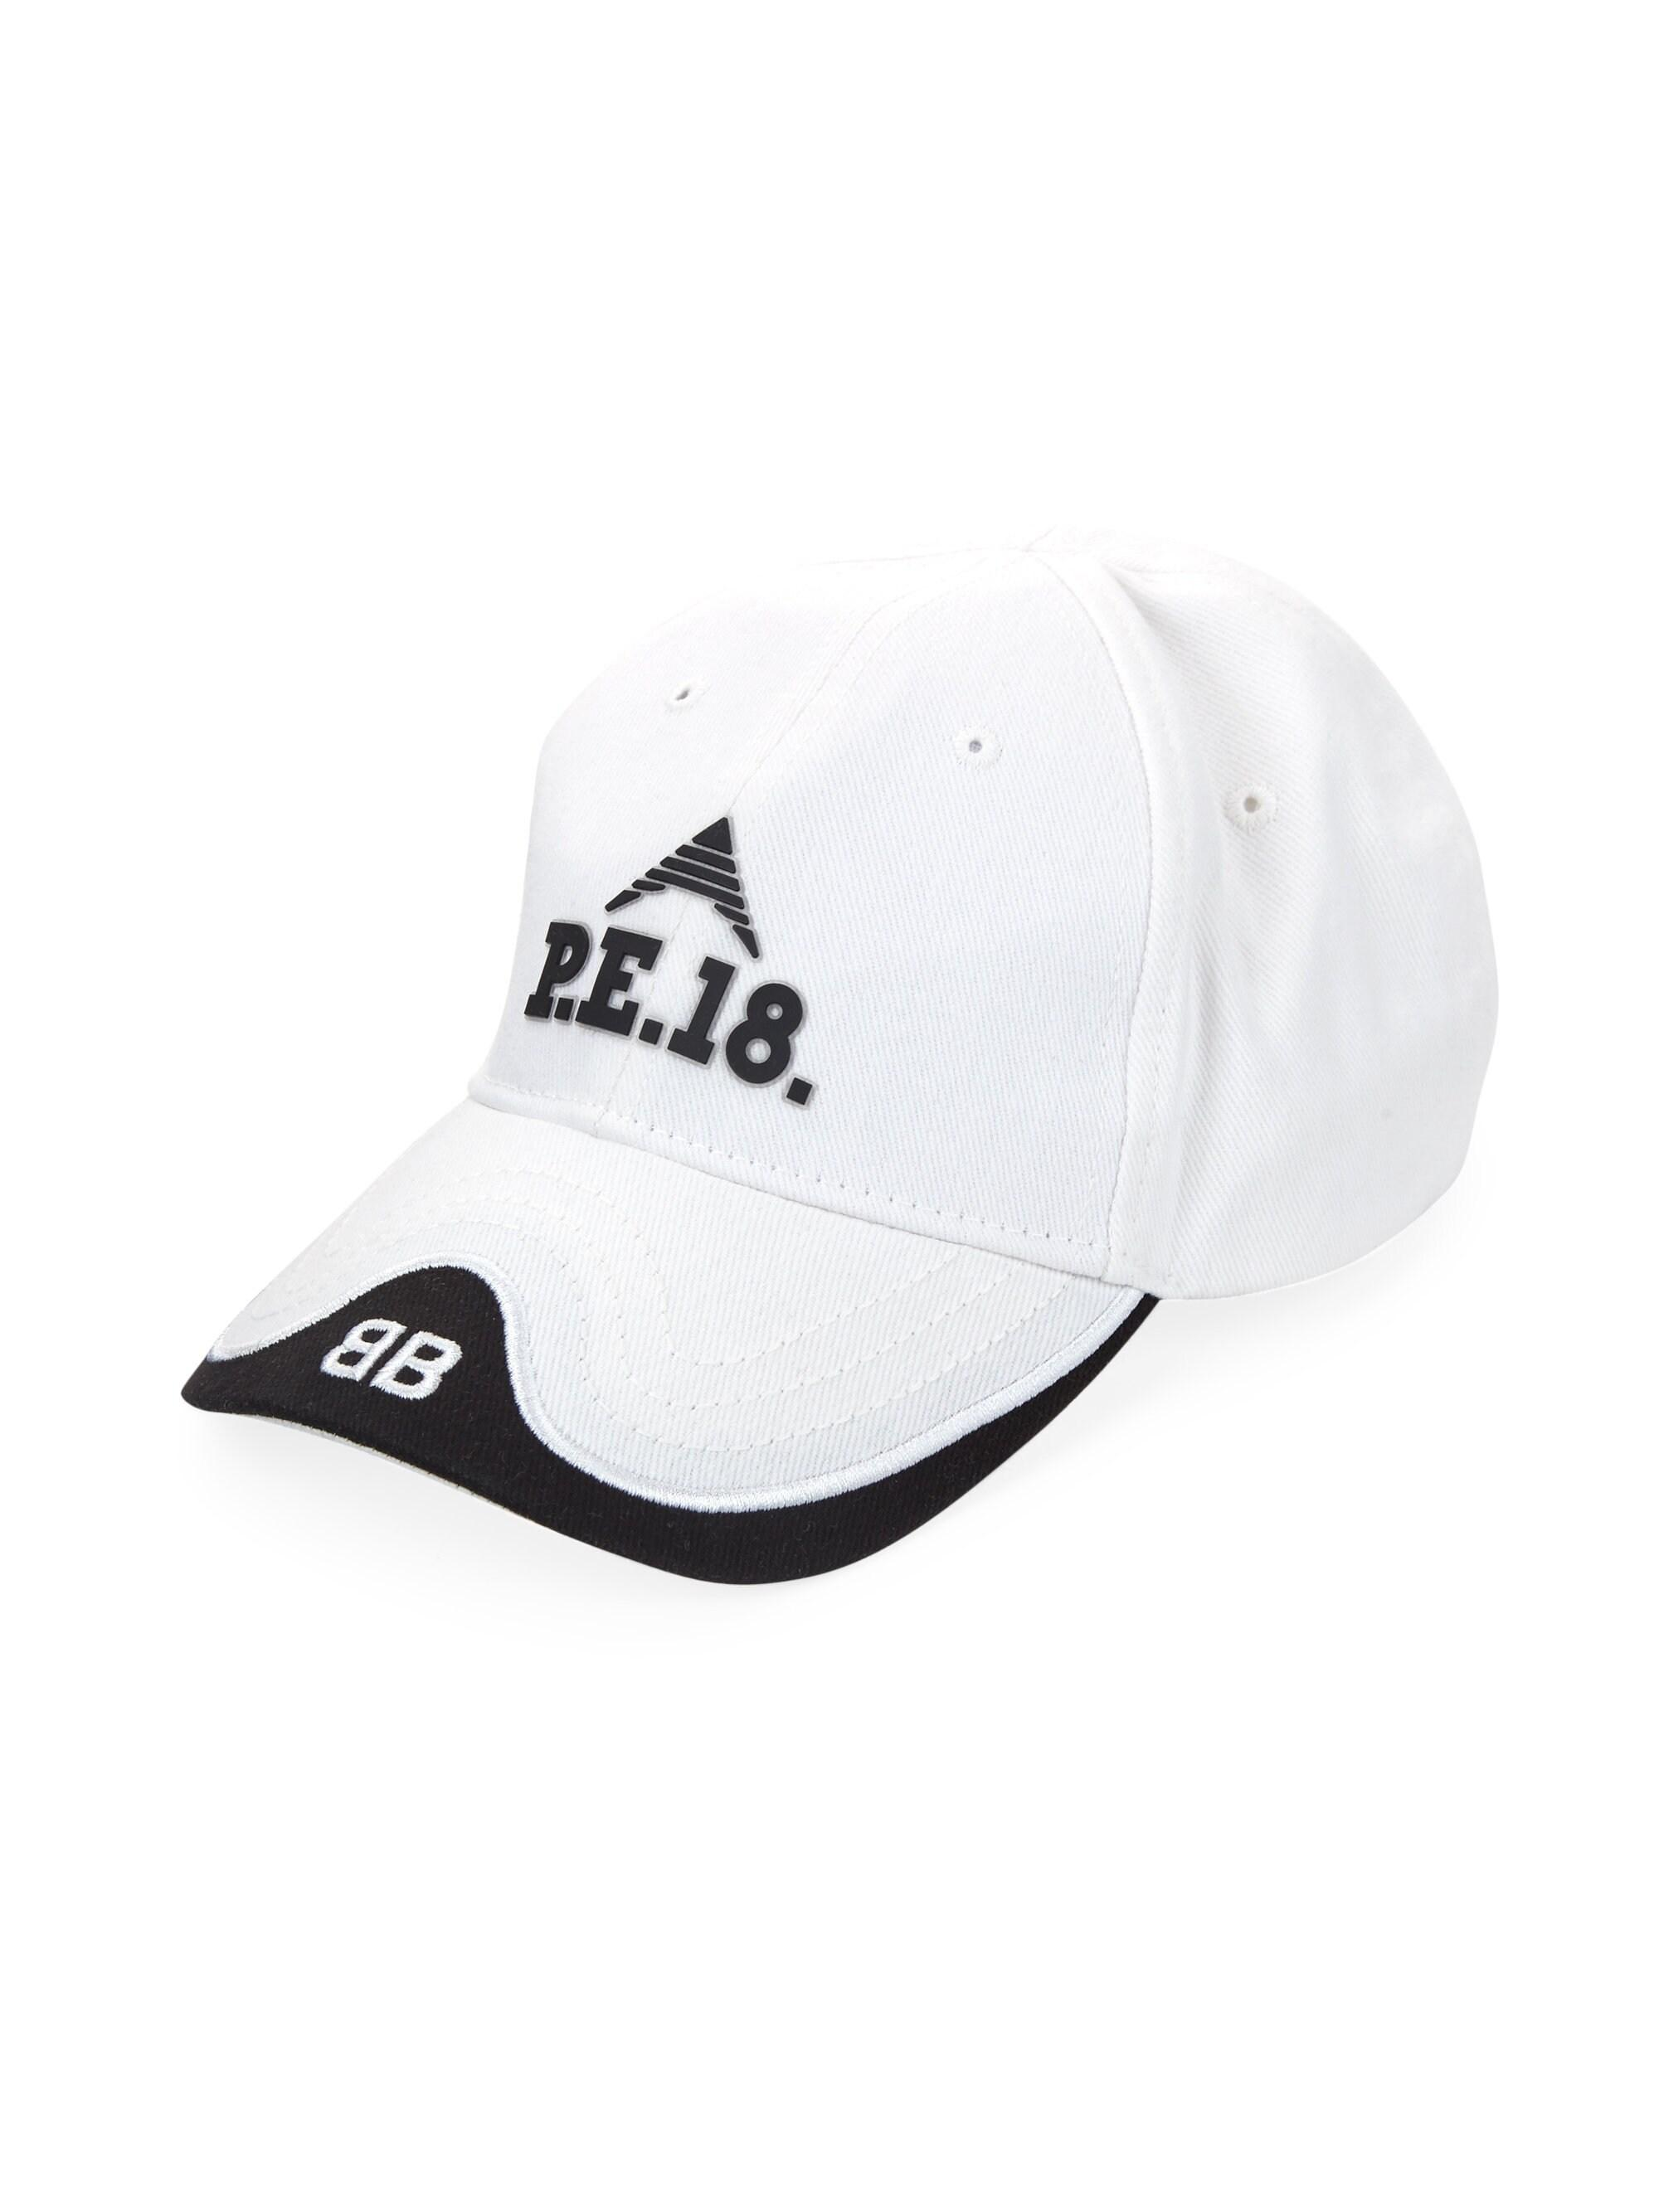 56368d41 Balenciaga Women's P.e. 18 Baseball Cap - White Black in White - Lyst